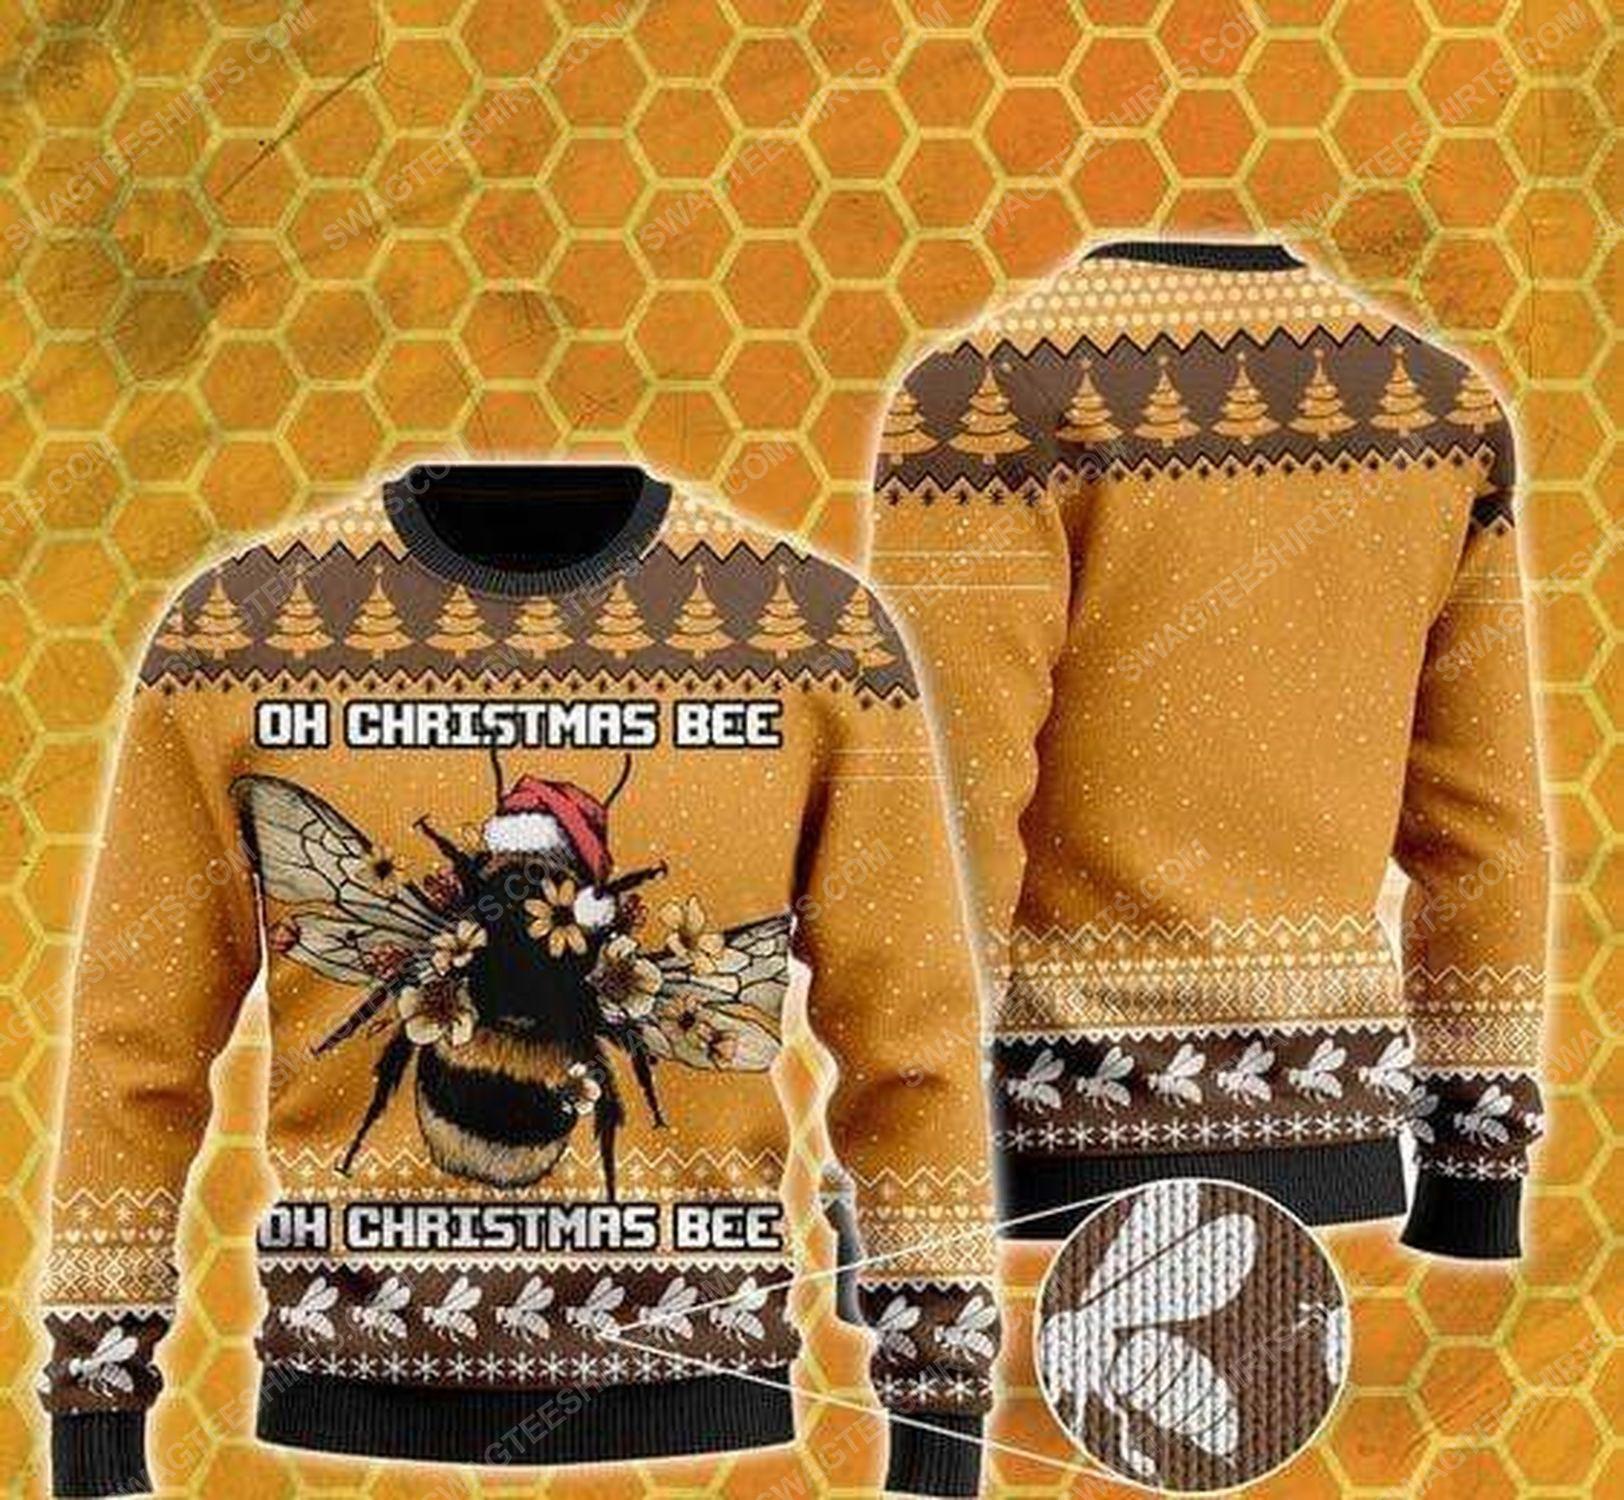 Oh christmas bee all over print ugly christmas sweater 1 - Copy